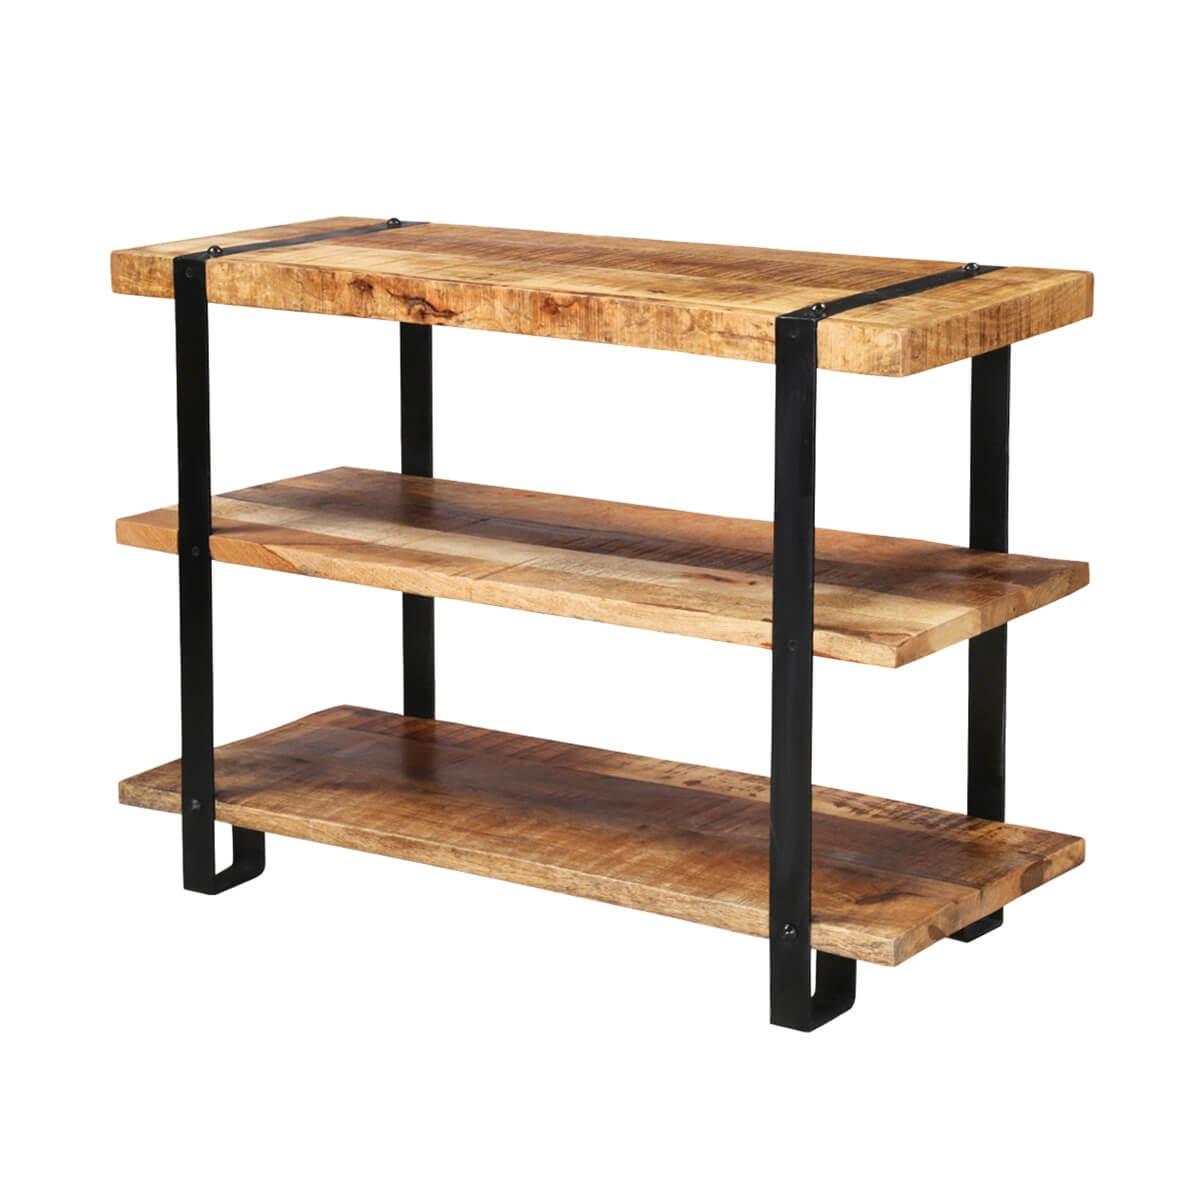 Grafton 3-Tier Open Shelf Rustic Solid Wood Industrial Bookcase